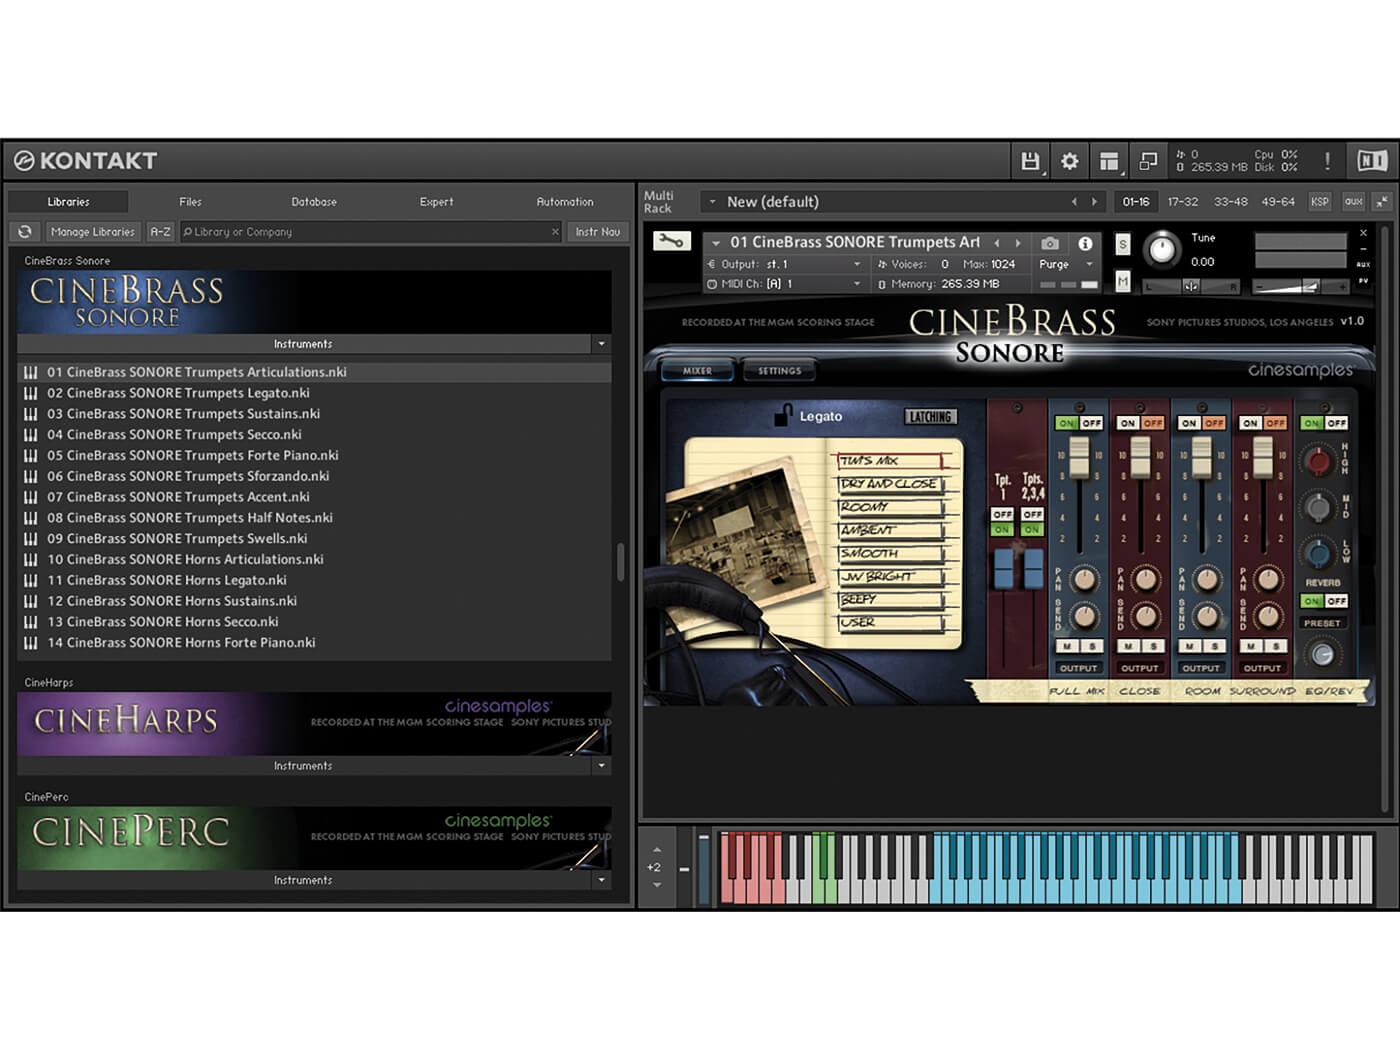 CineBrass Sonore GUI 3